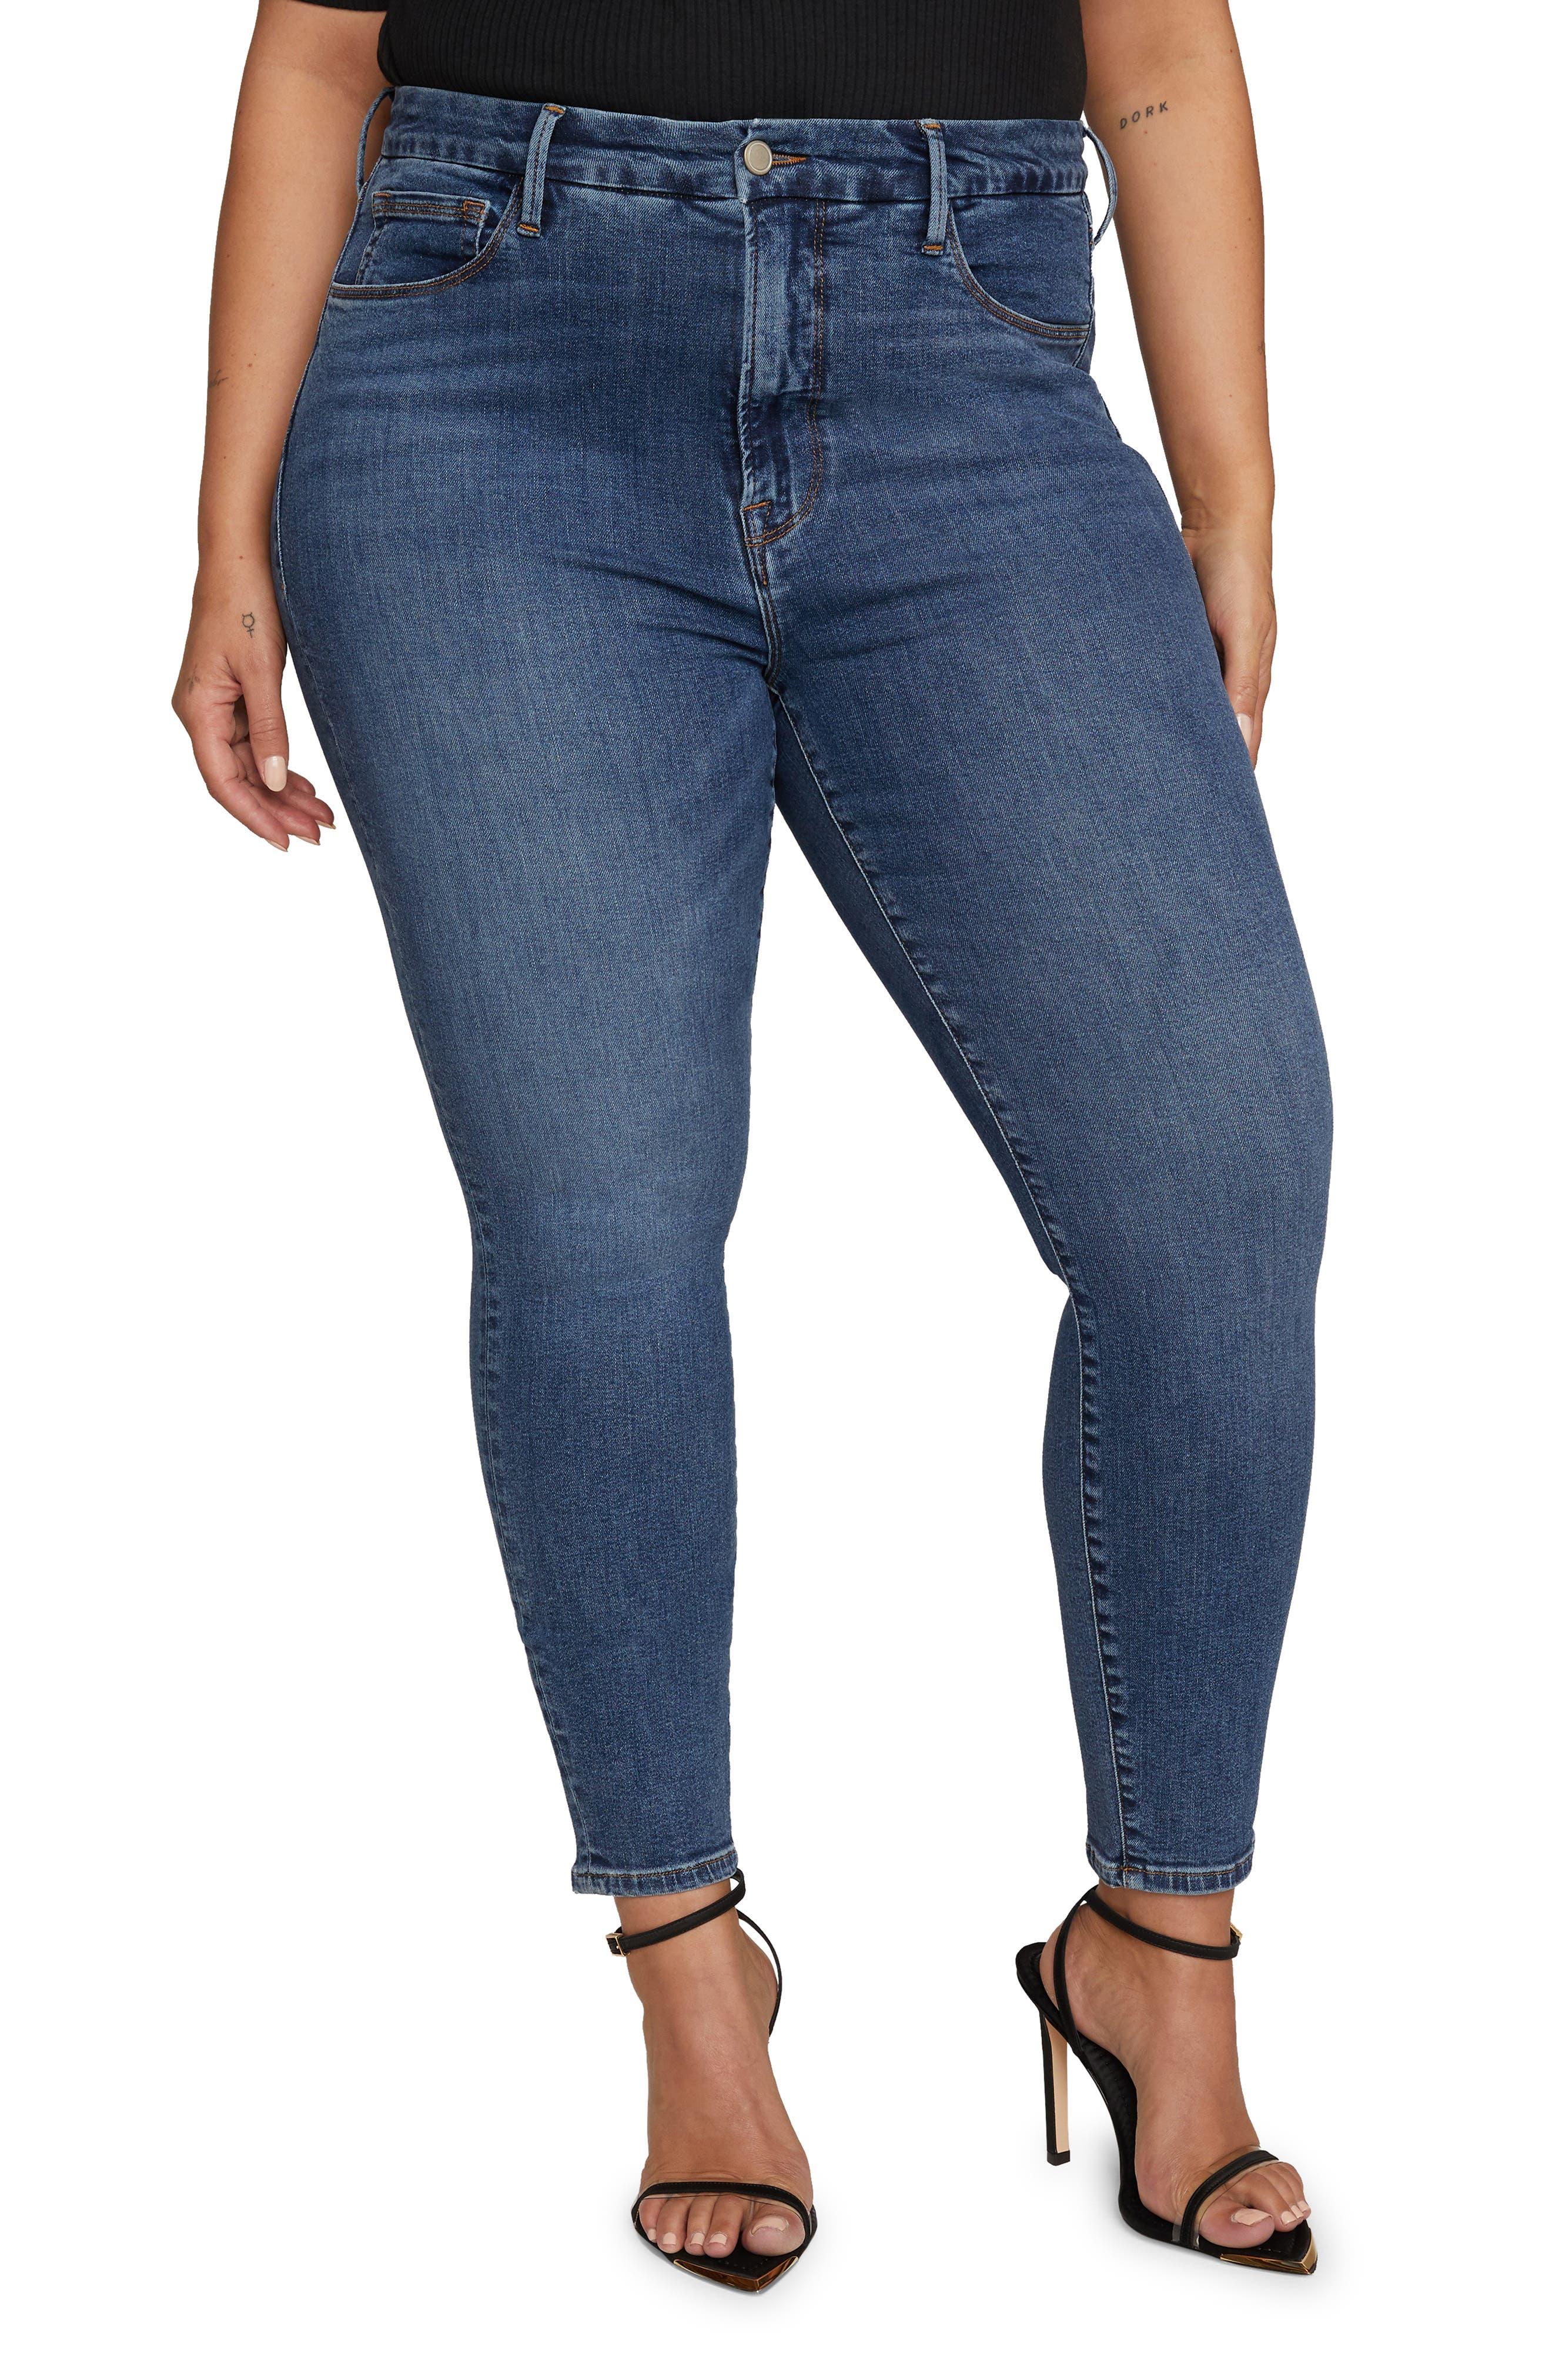 Good Legs High Waist Crop Extreme V Jeans